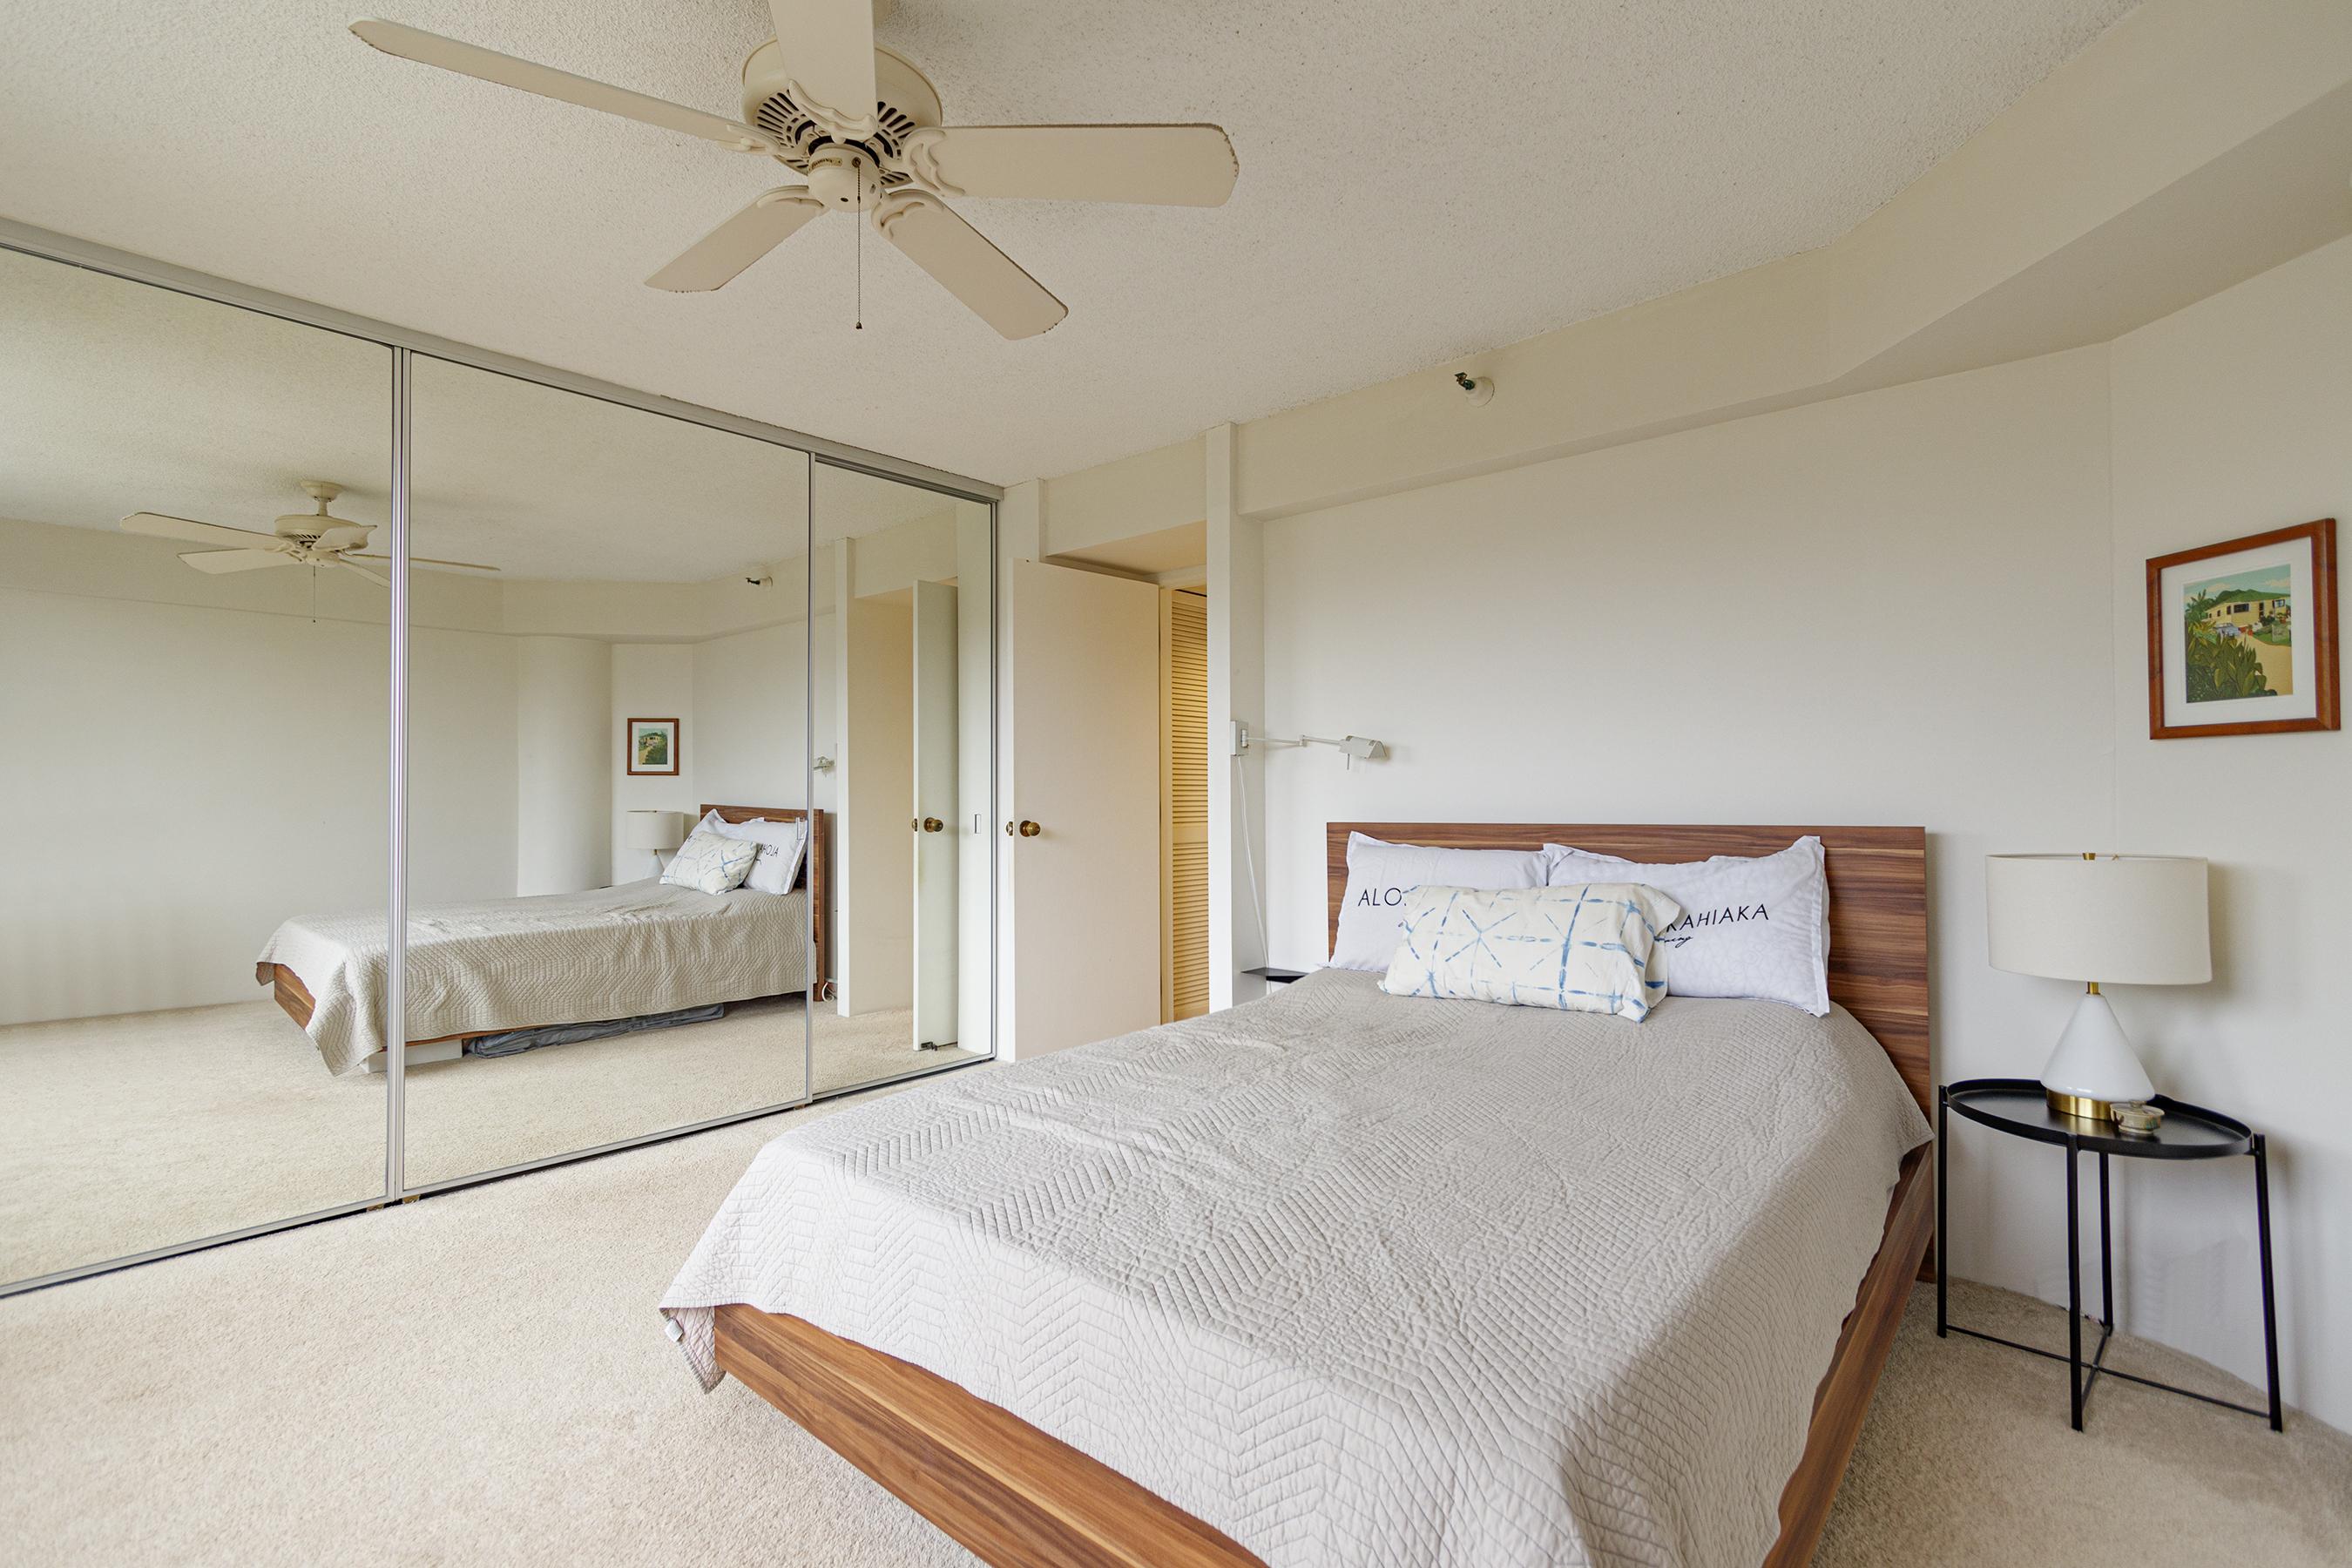 Bedroom at 2101 Nuuanu Ave #I/1806 Honolulu, HI 96817